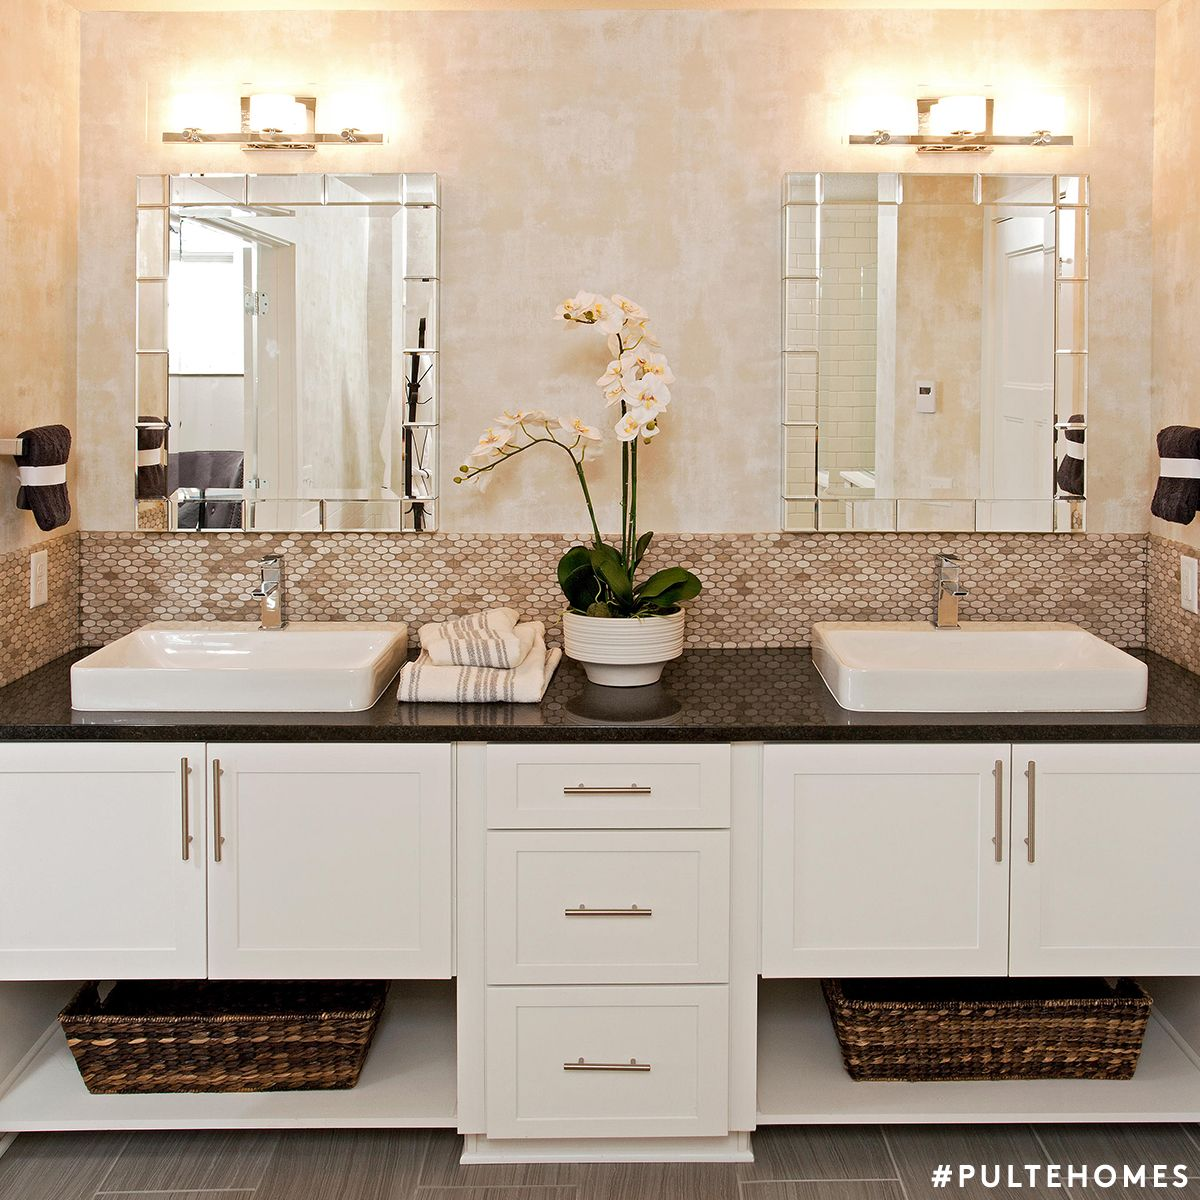 13 Dreamy Bathroom Lighting Ideas: This Bathroom Dressed In White & Tan Looks So Fresh